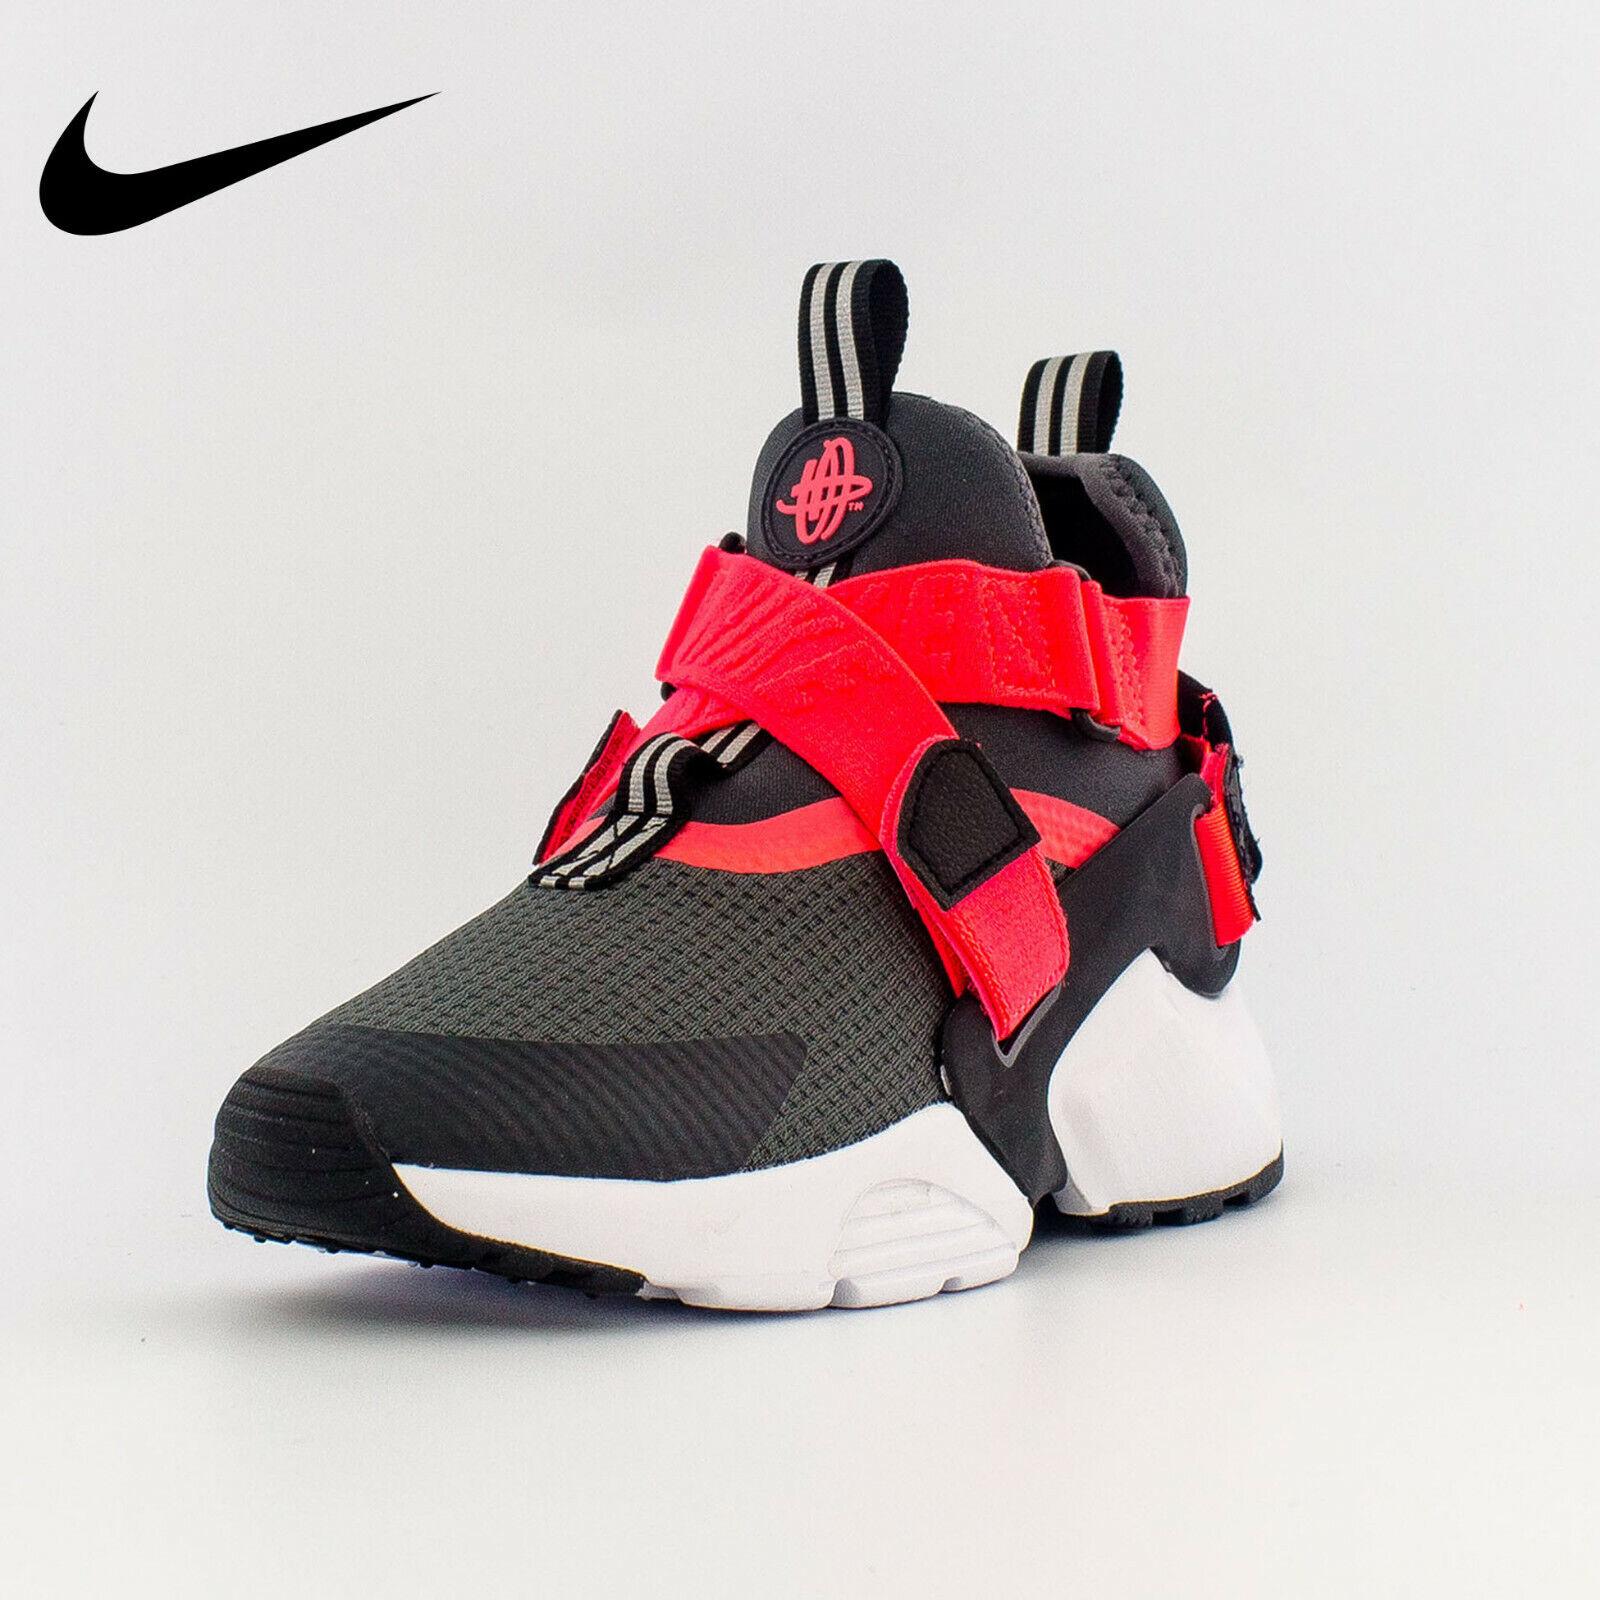 Nike Huarache City Sz 7 7y GS Big Kids' Shoes Anthracite Black Solar Red Strap